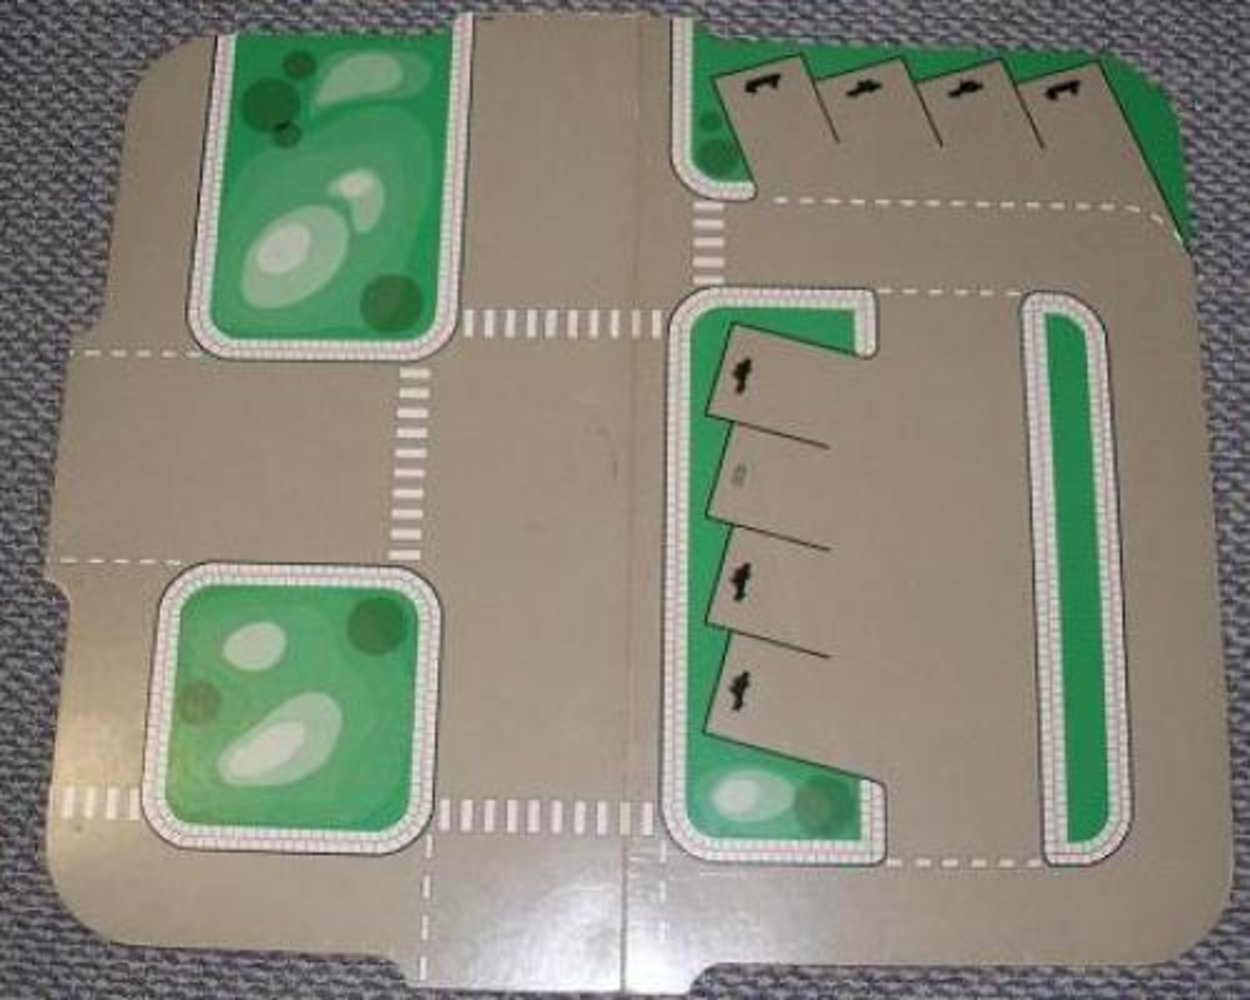 Environment Plate